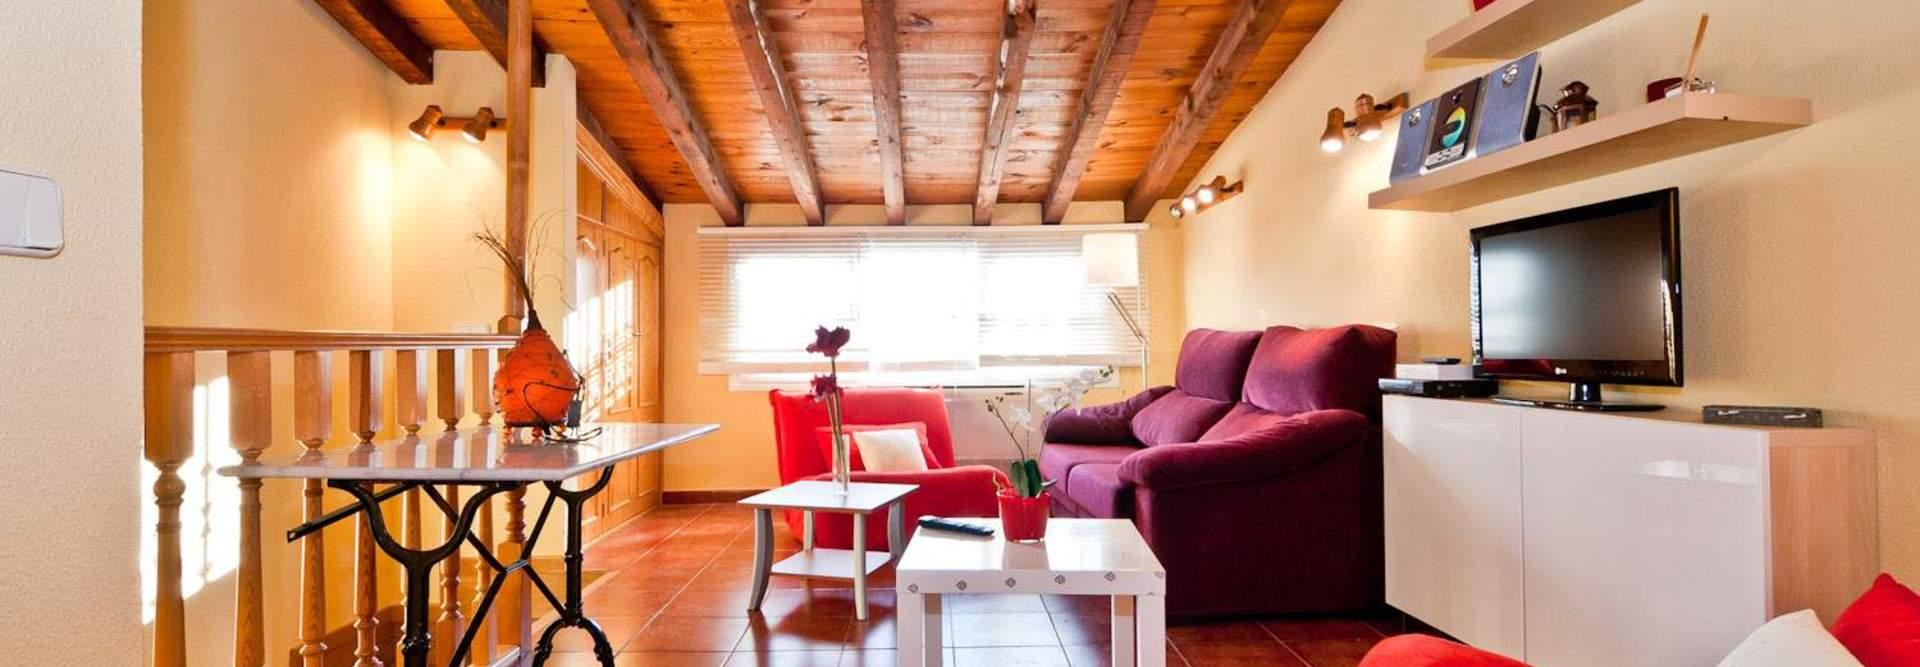 Property in madrid, spain, to rent from private landlords and real estate agents. PRECIADOS ATICO - Alquiler de apartamento en centro Madrid